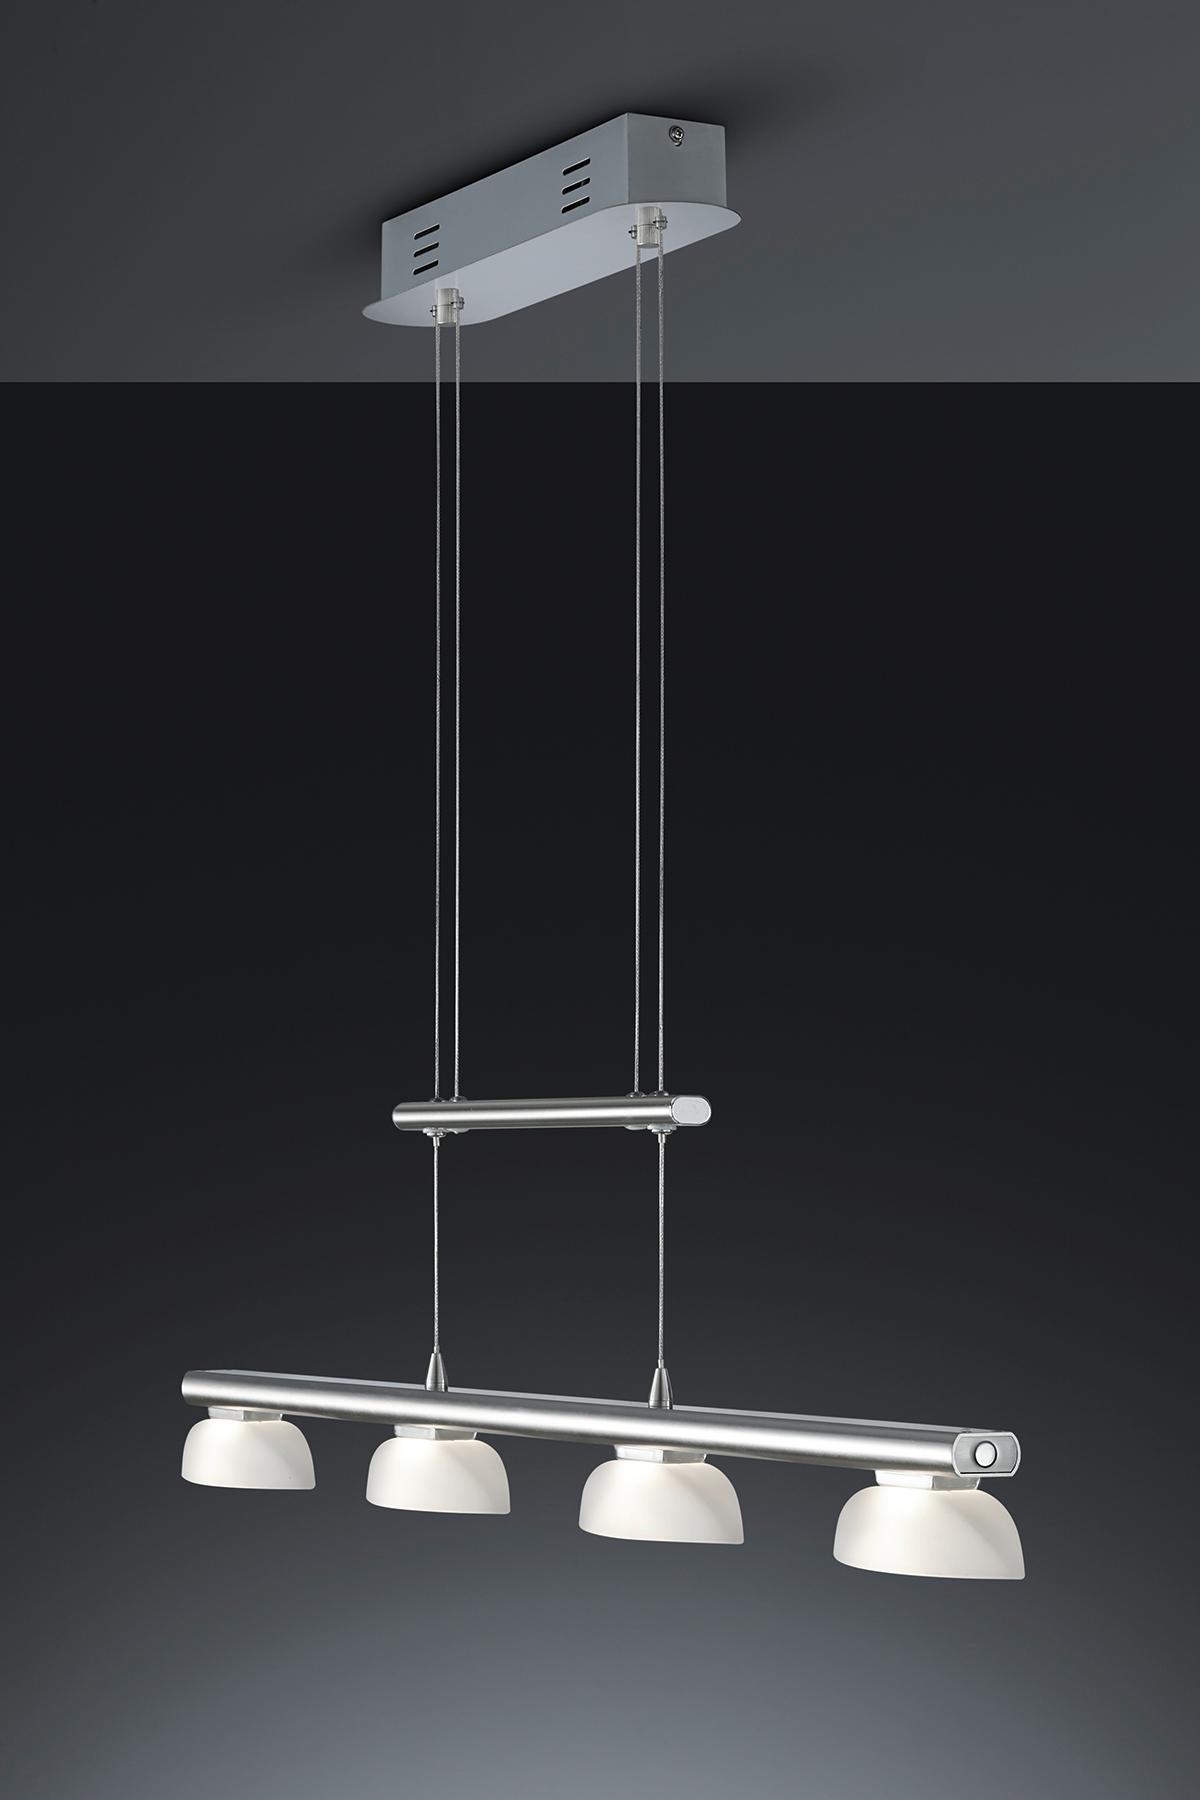 trio leuchten led jojo pendelleuchte senator nickel matt glas wei 324390407. Black Bedroom Furniture Sets. Home Design Ideas